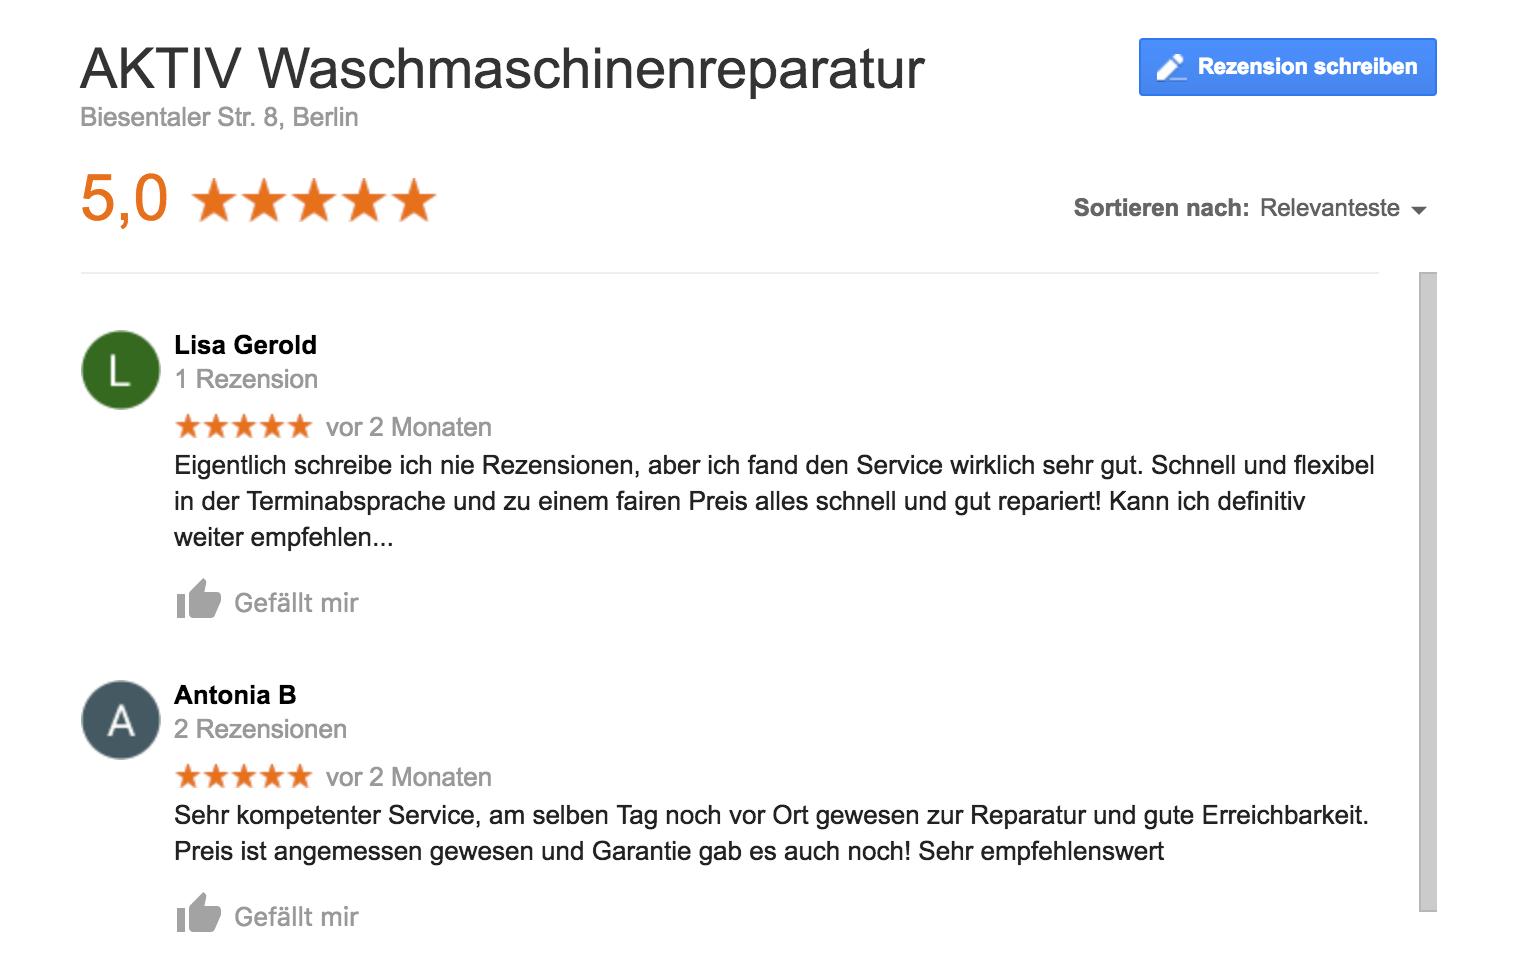 Waschmaschinenreparatur_Berlin_Bewertungen_1